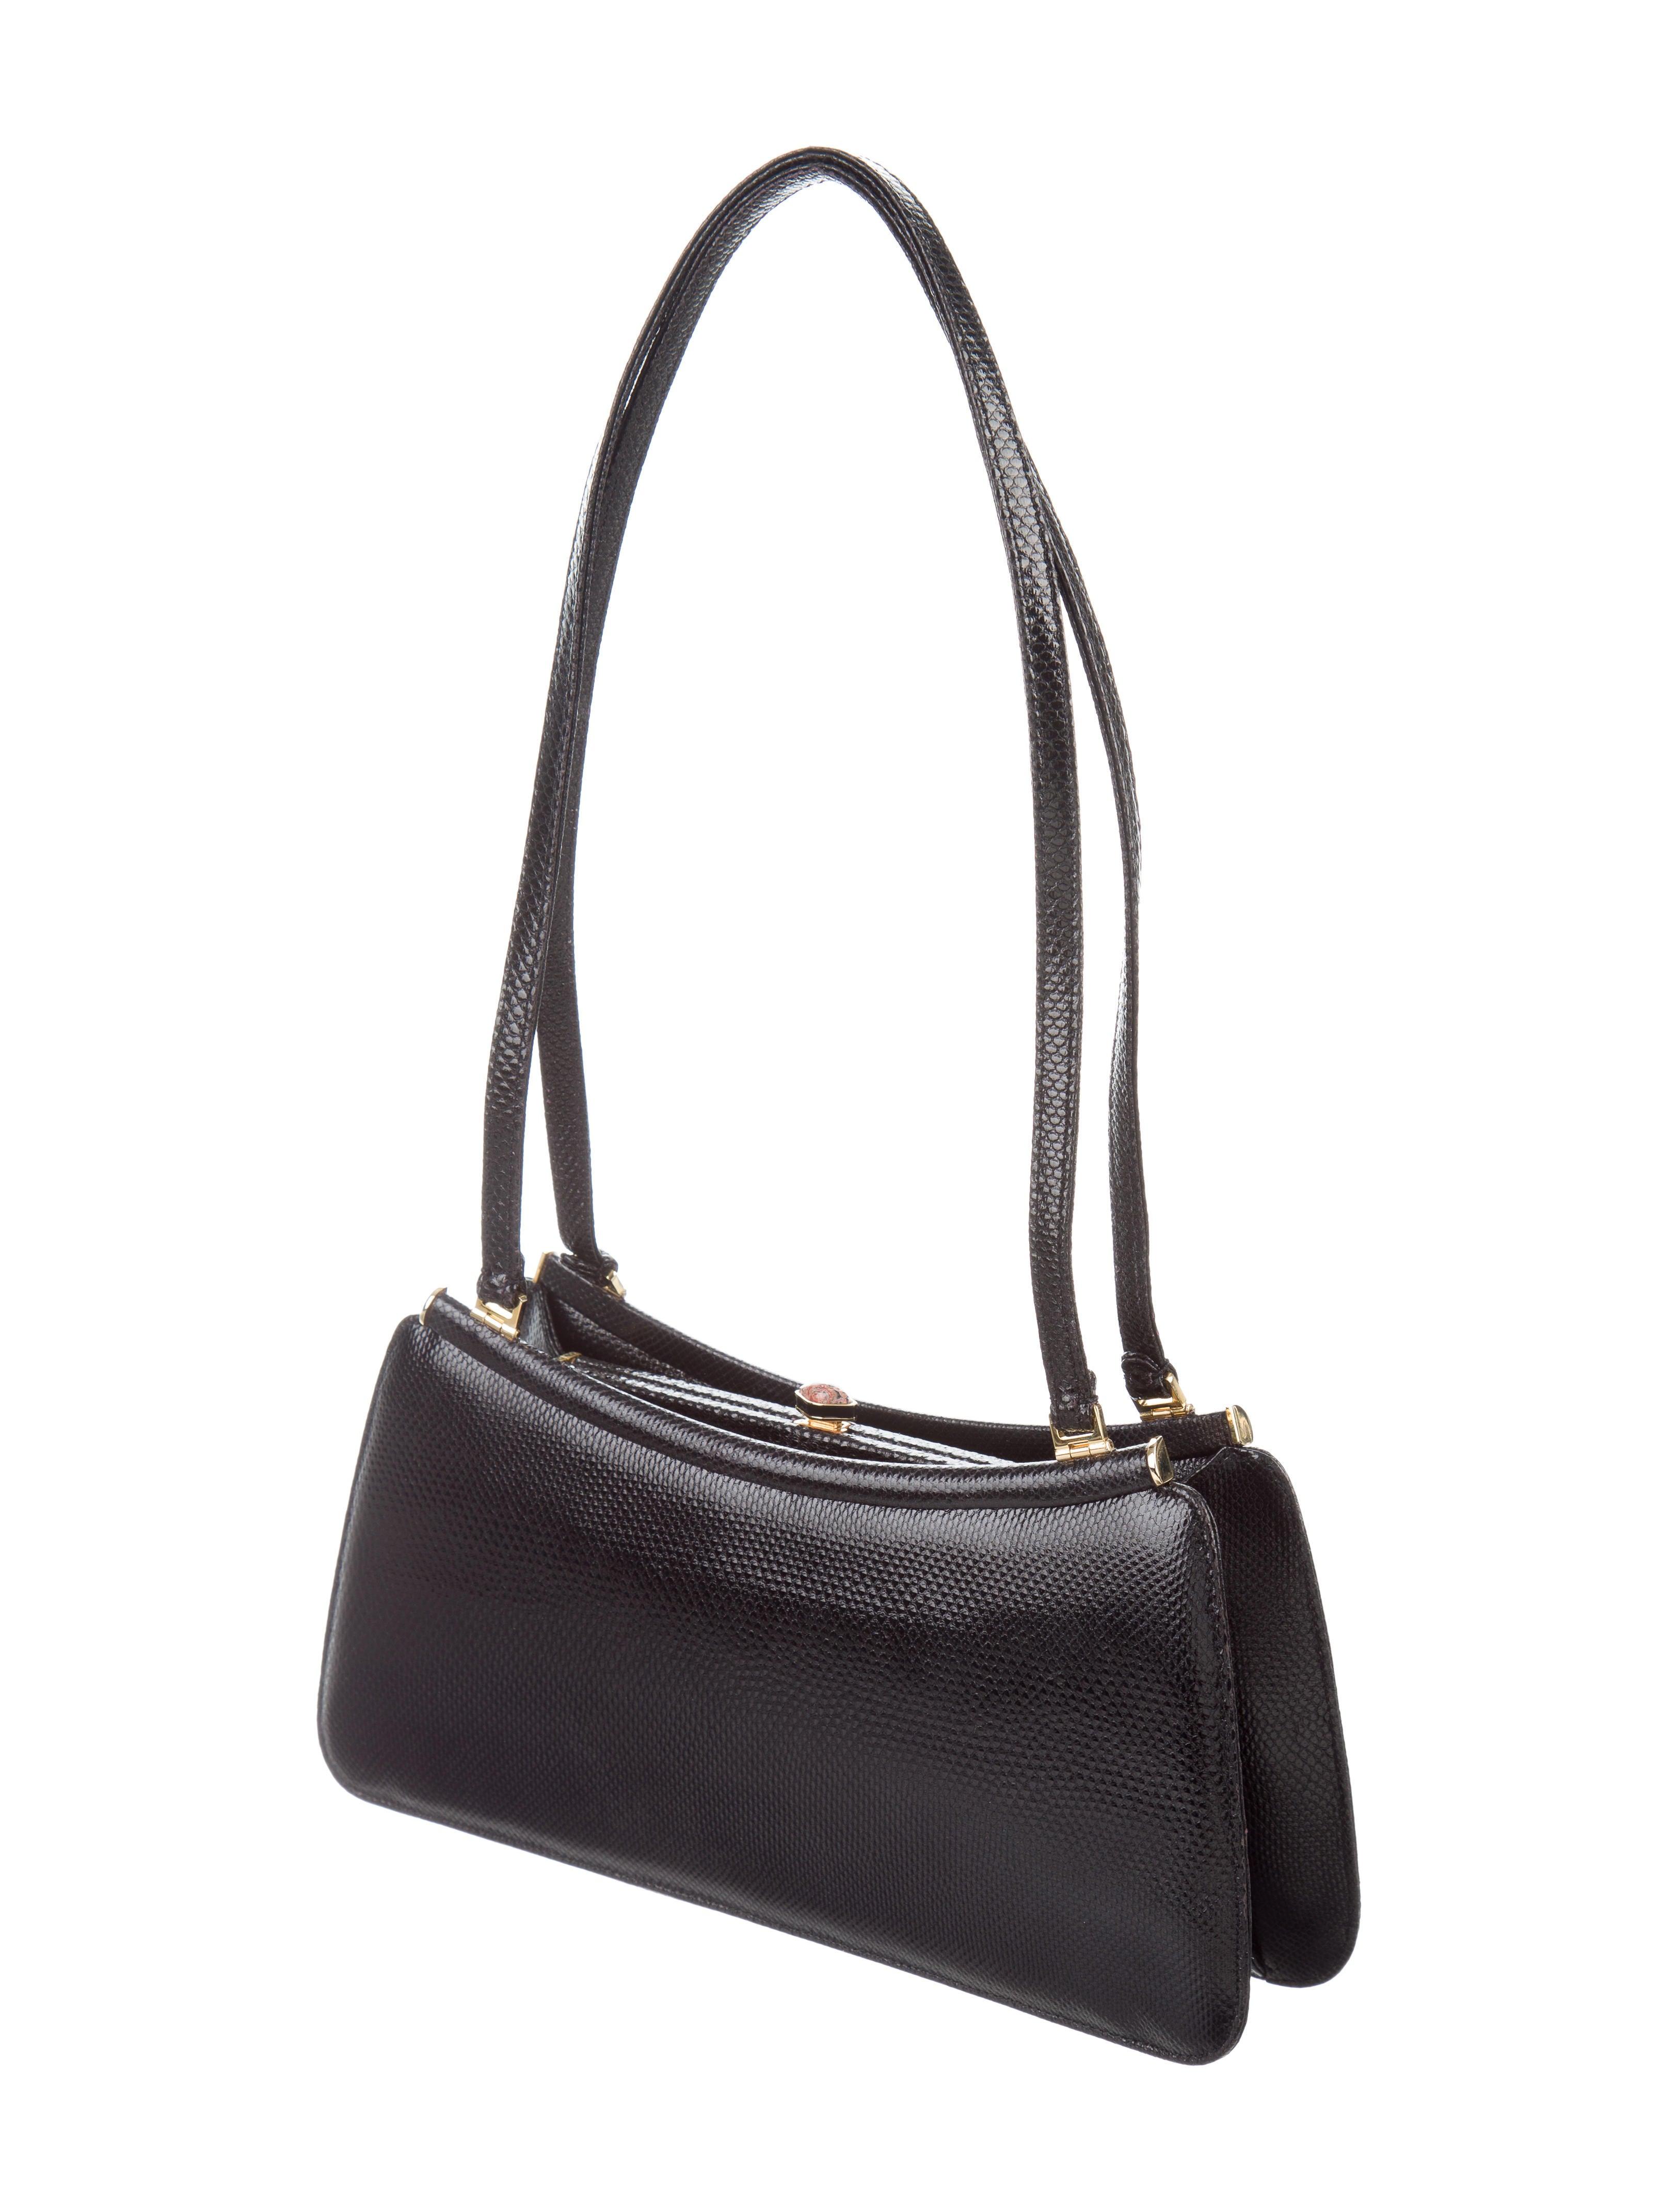 Judith Leiber Karung Shoulder Bag - Handbags